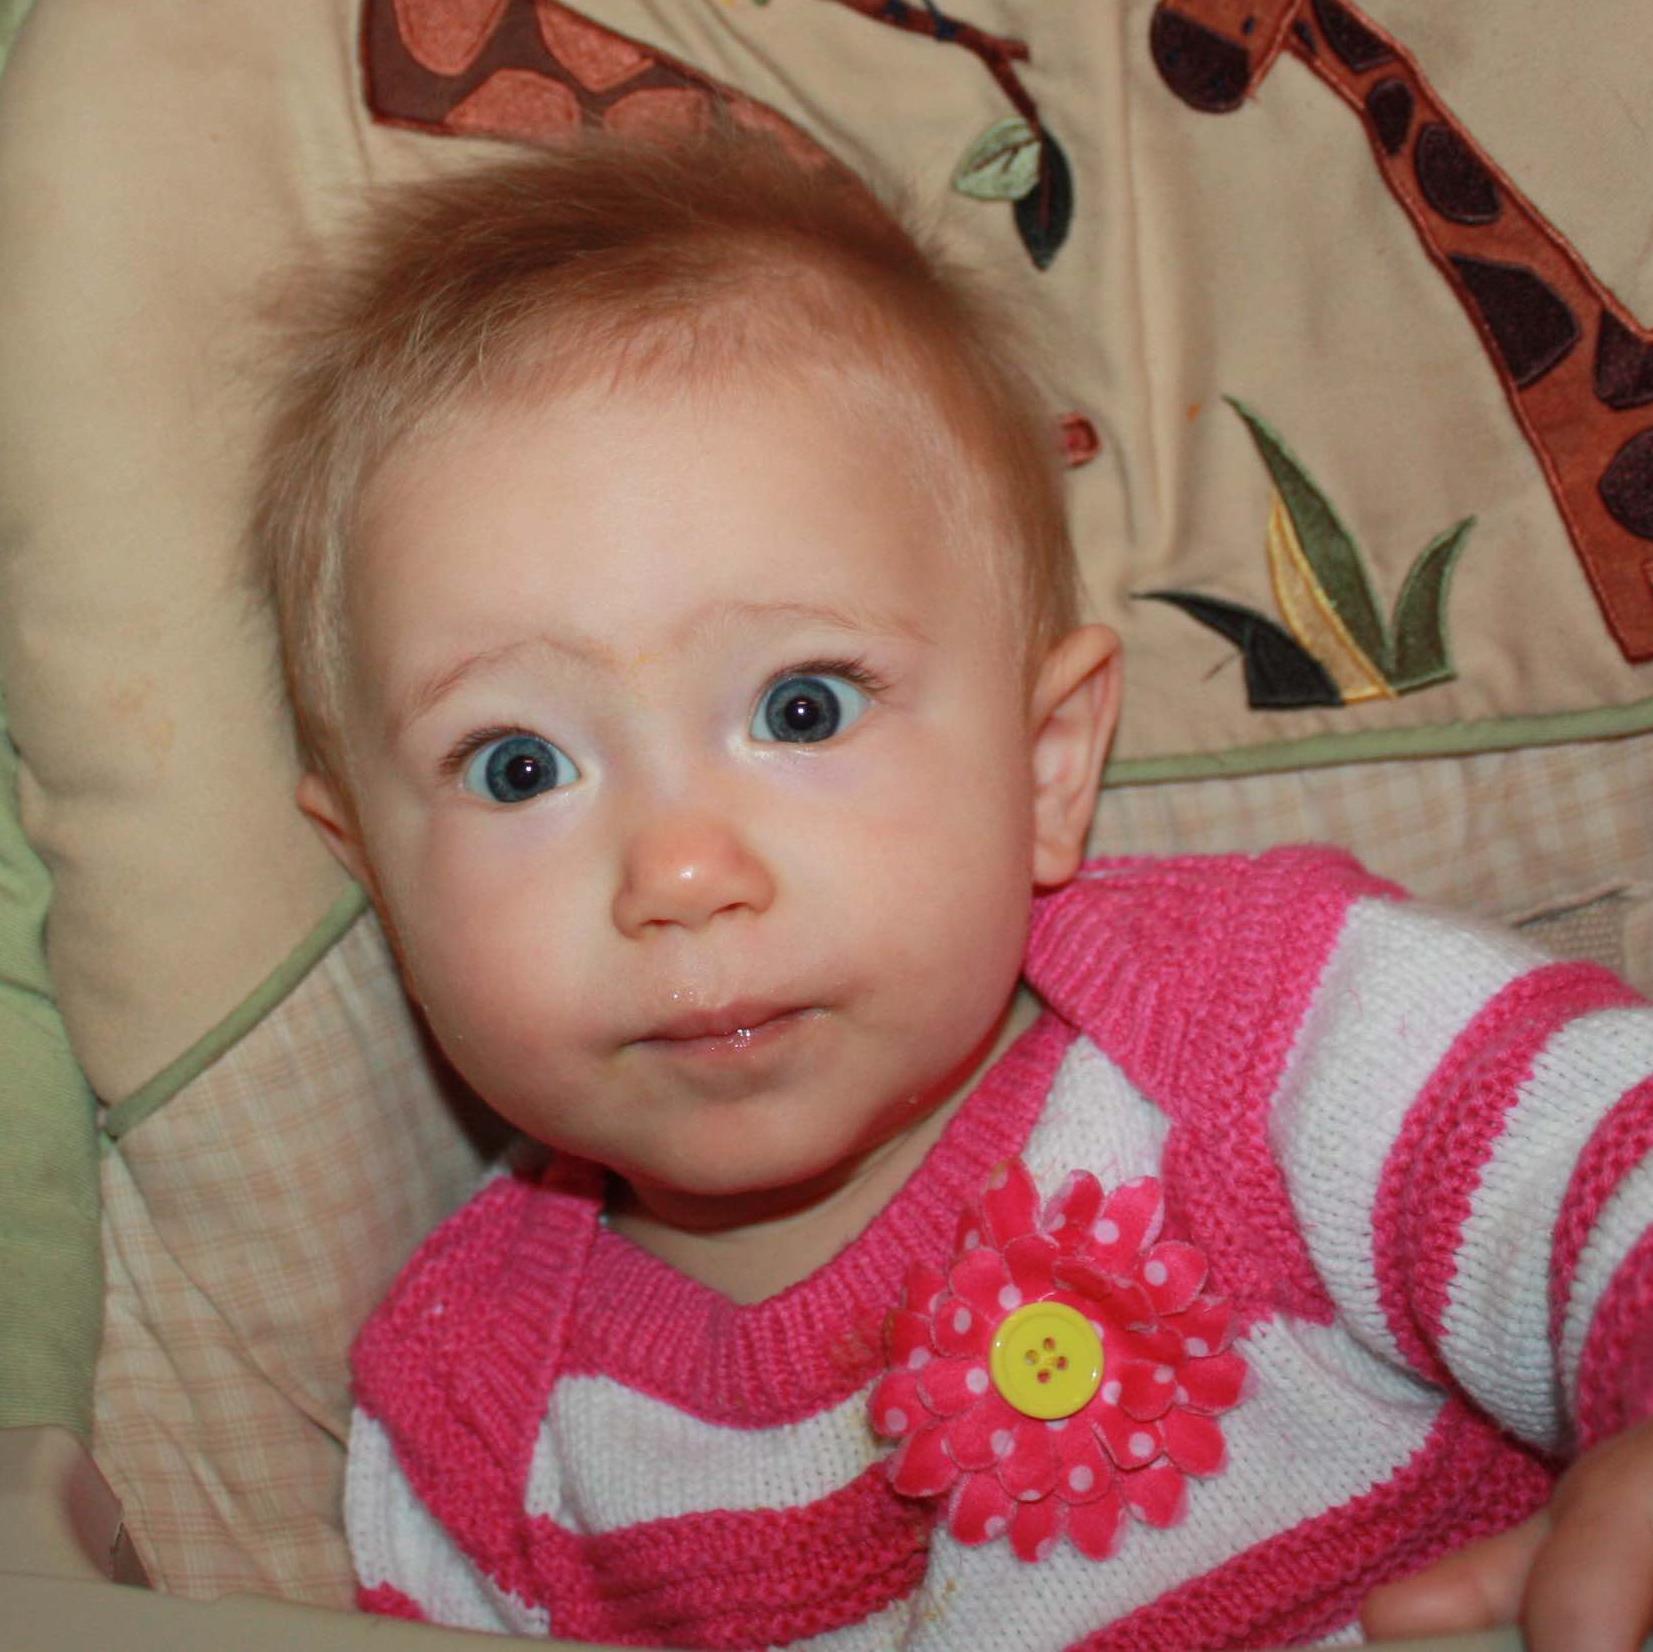 Fundraising for National Alopecia Areata Foundation